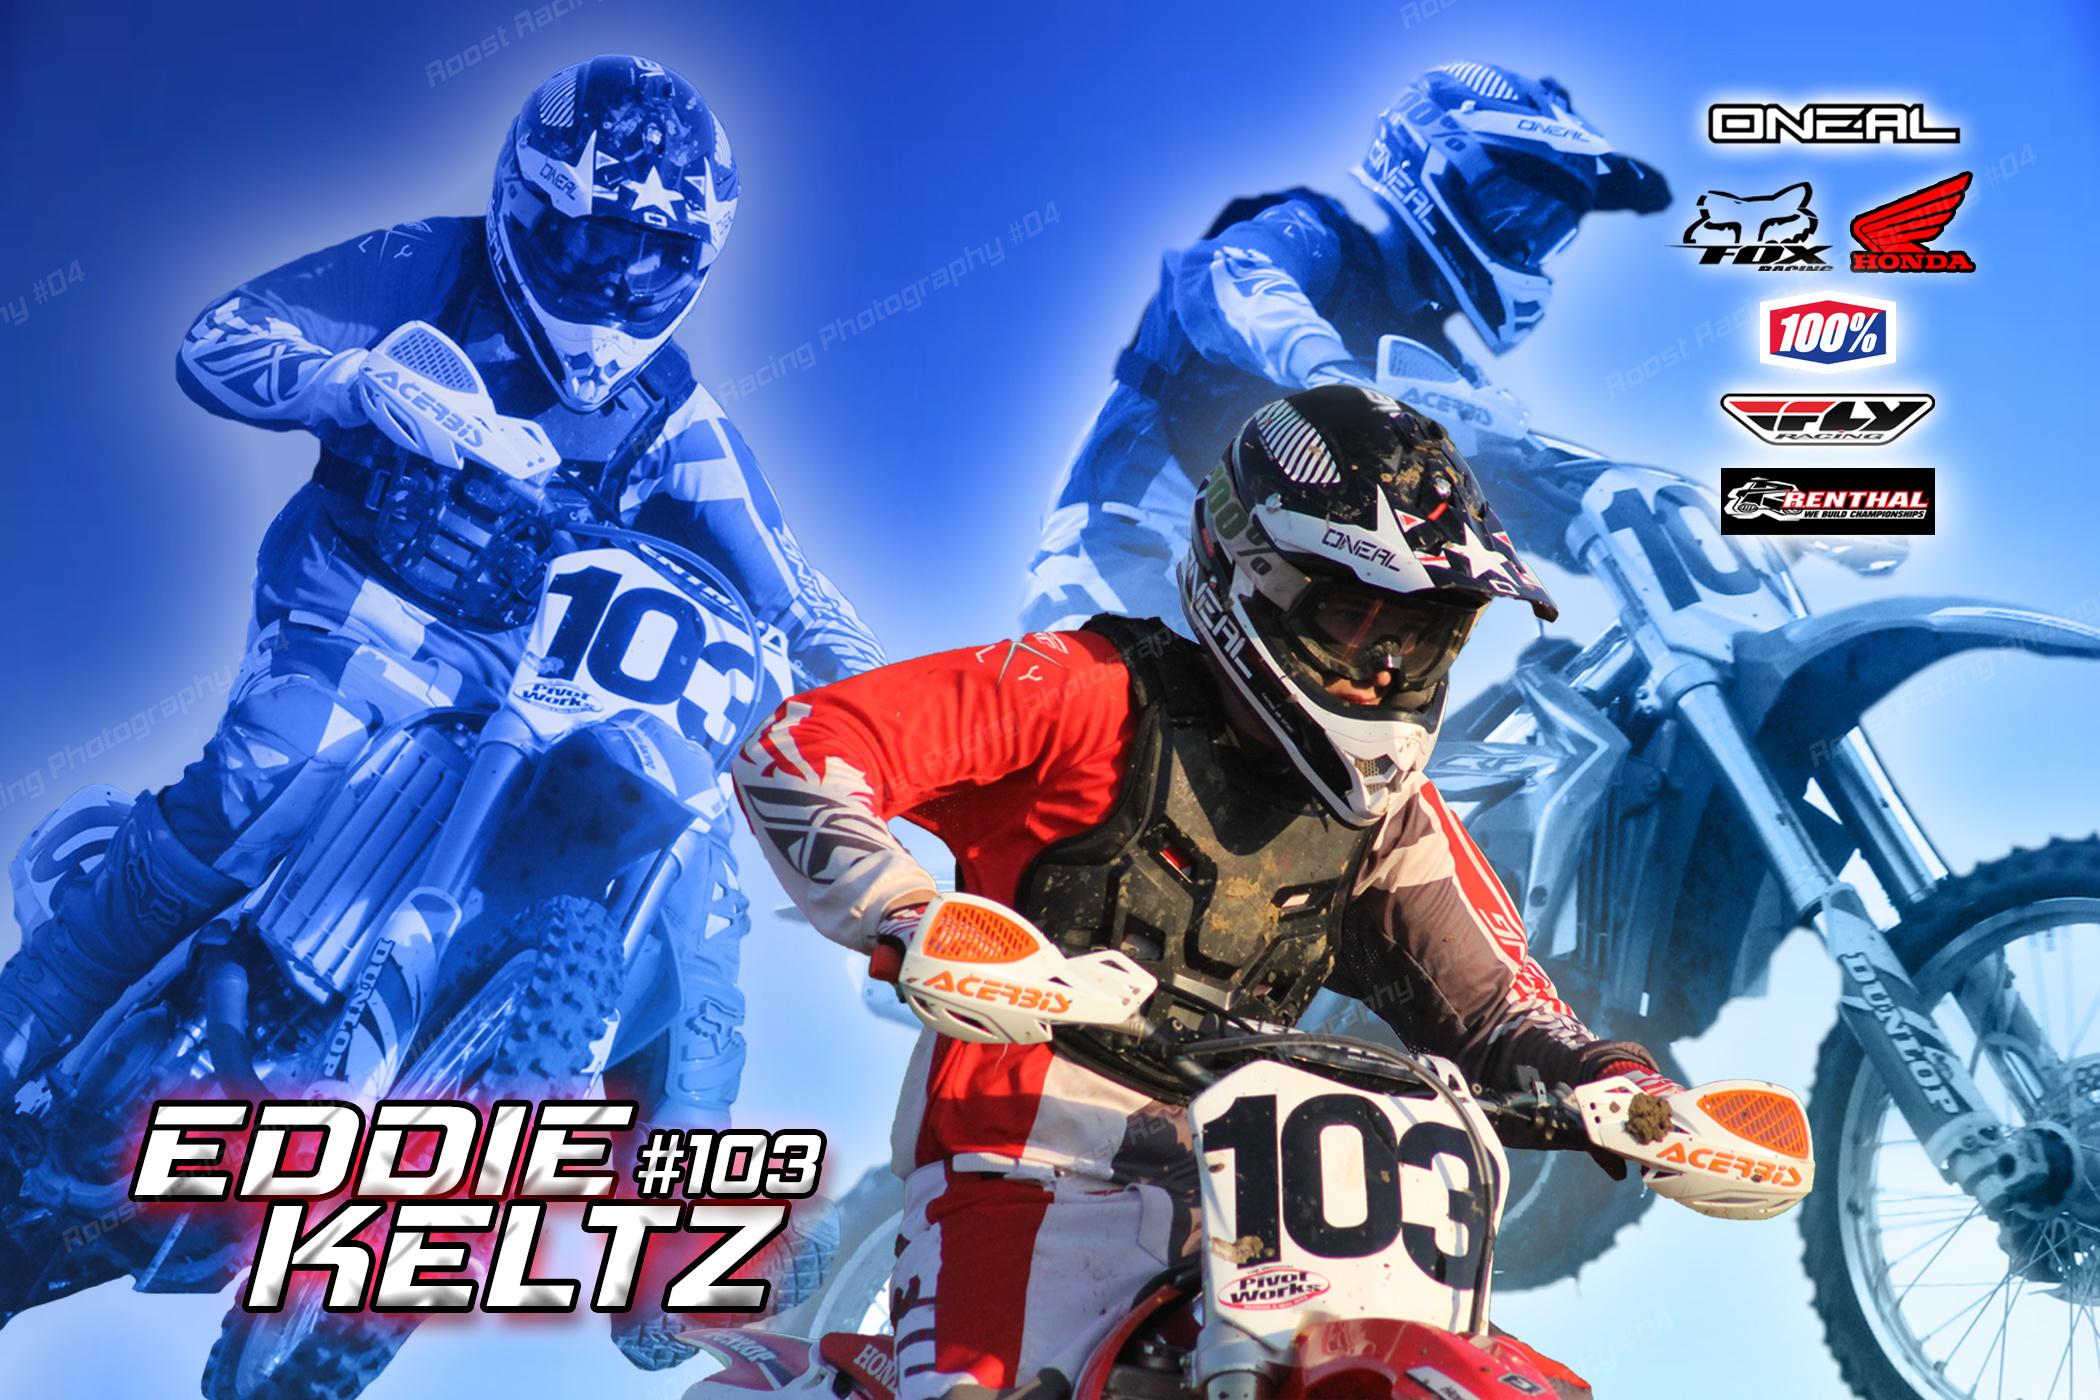 #103 Eddie Keltz